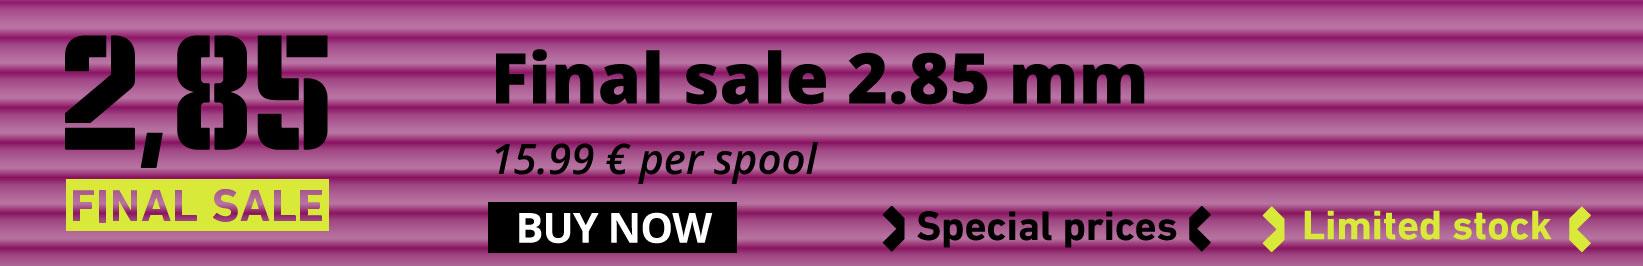 2.85 mm big sale